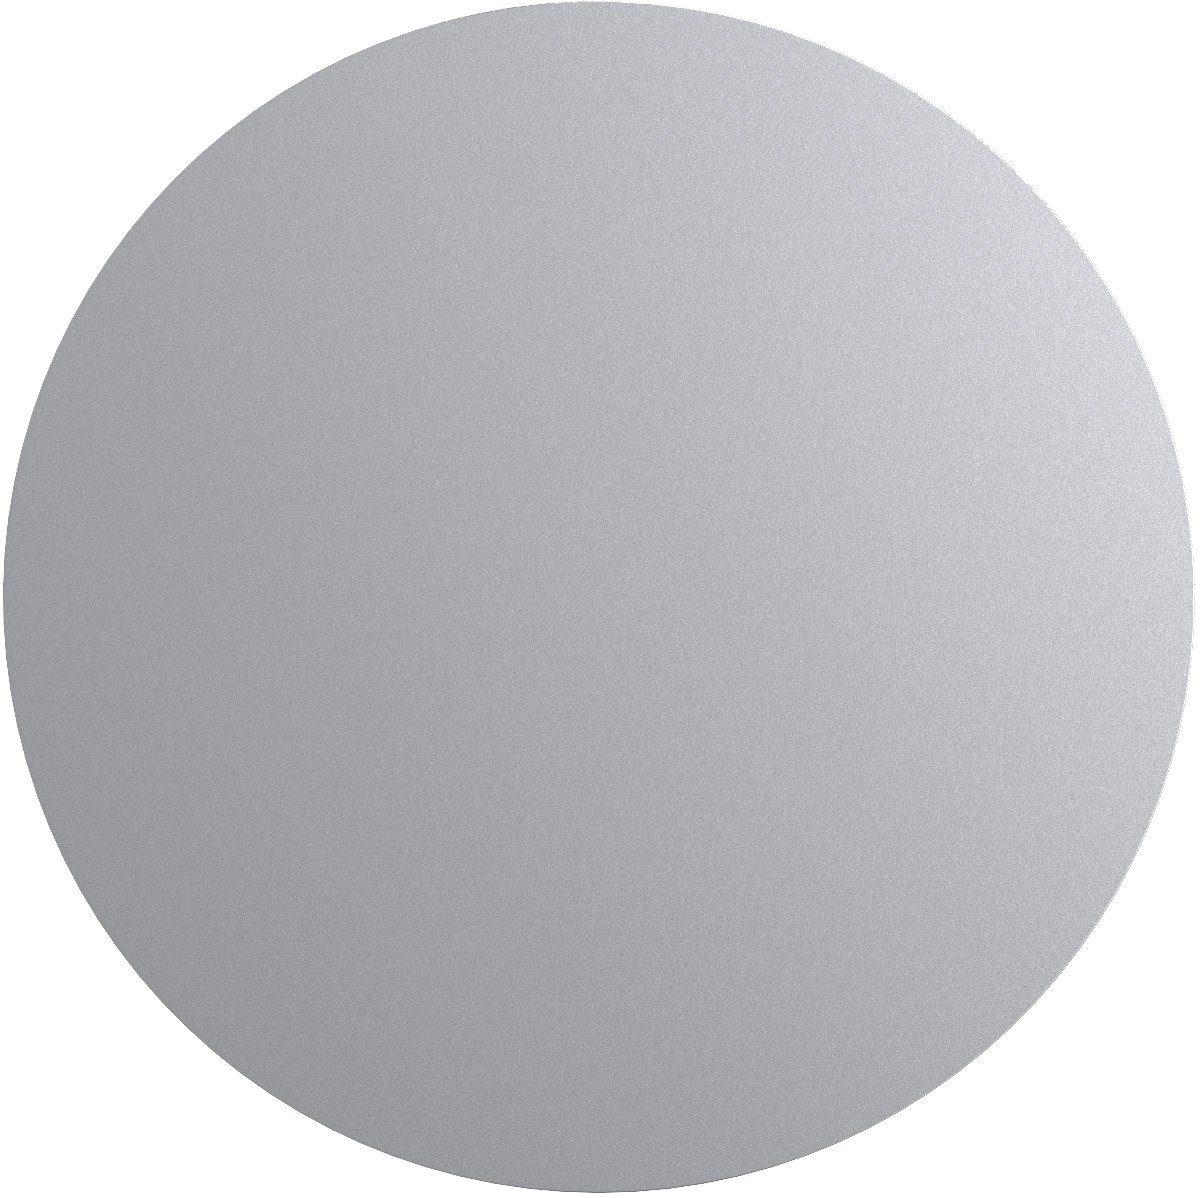 Nordlux LED Außenleuchte, 1 flg., Wandleuchte, »UNO DISC«